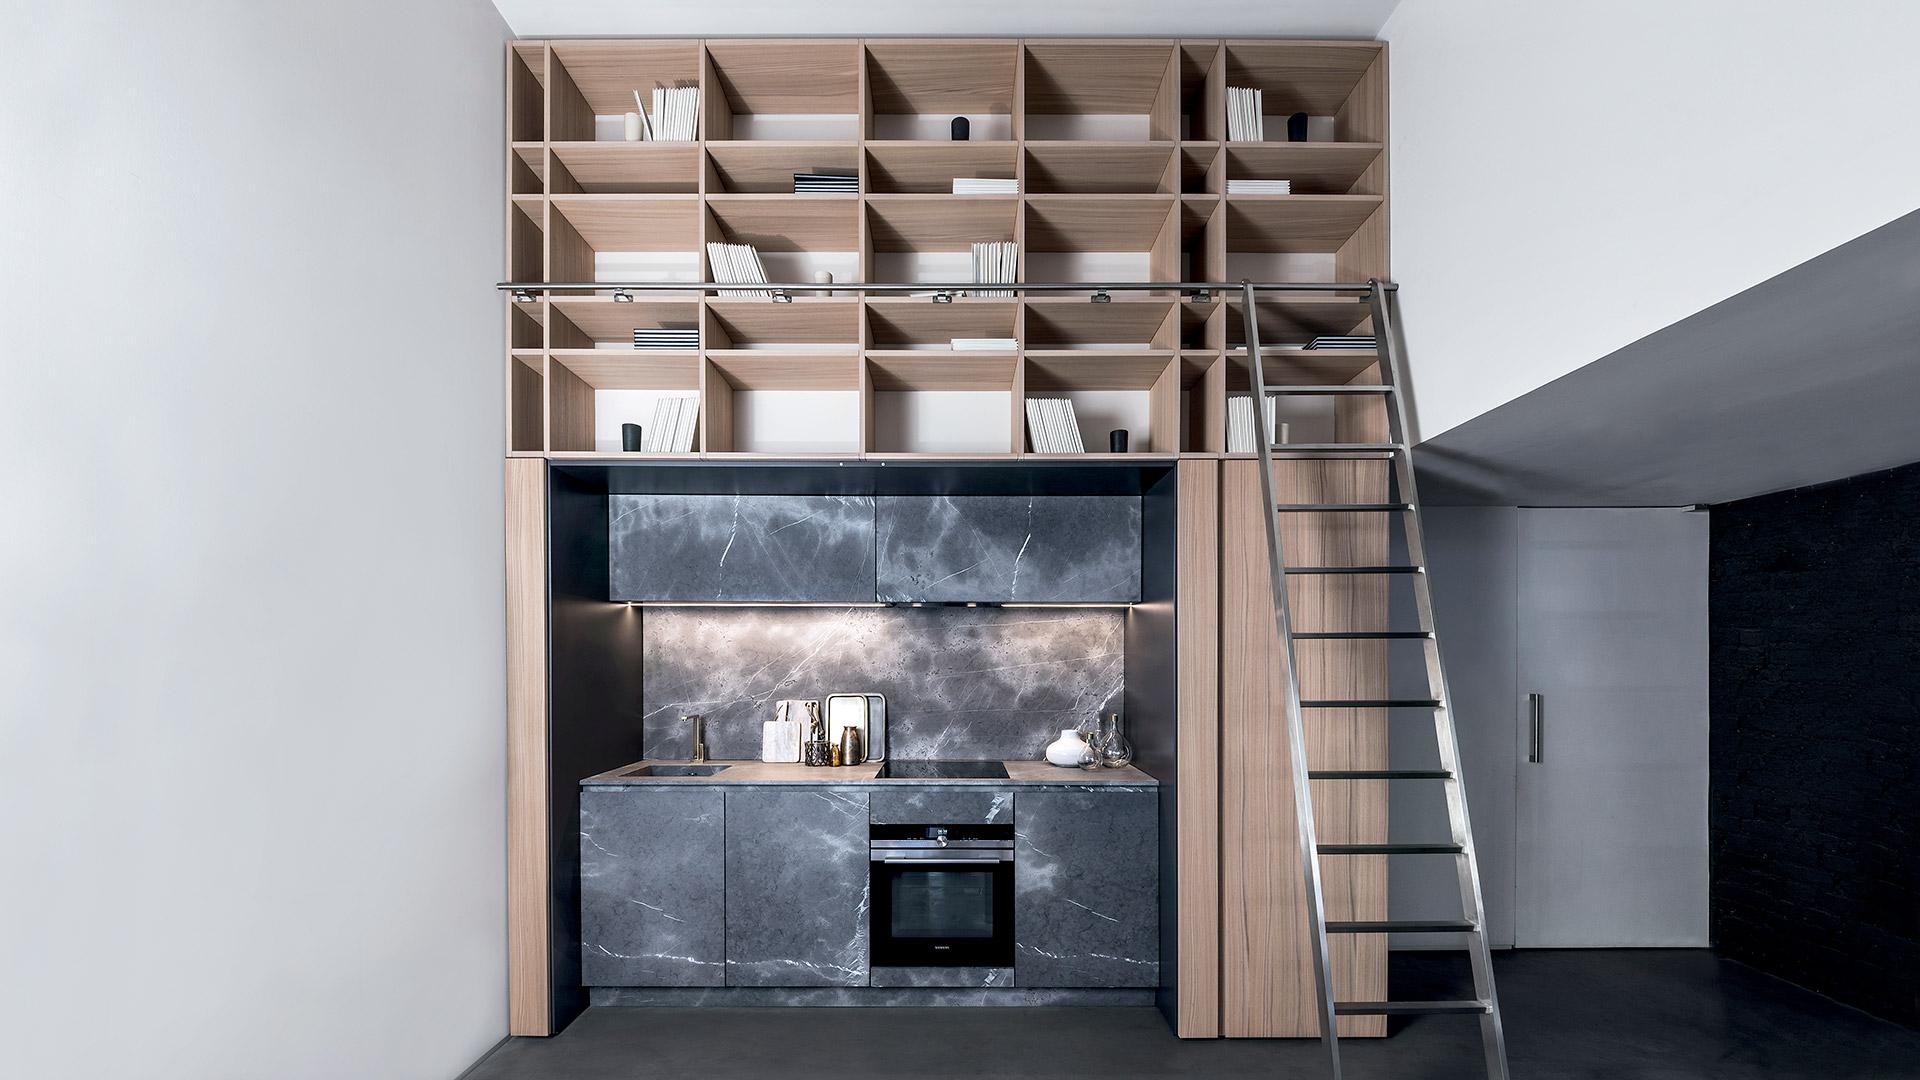 Corinthian stone kitchen with wood elm - TM_LN17_LAUREN_001